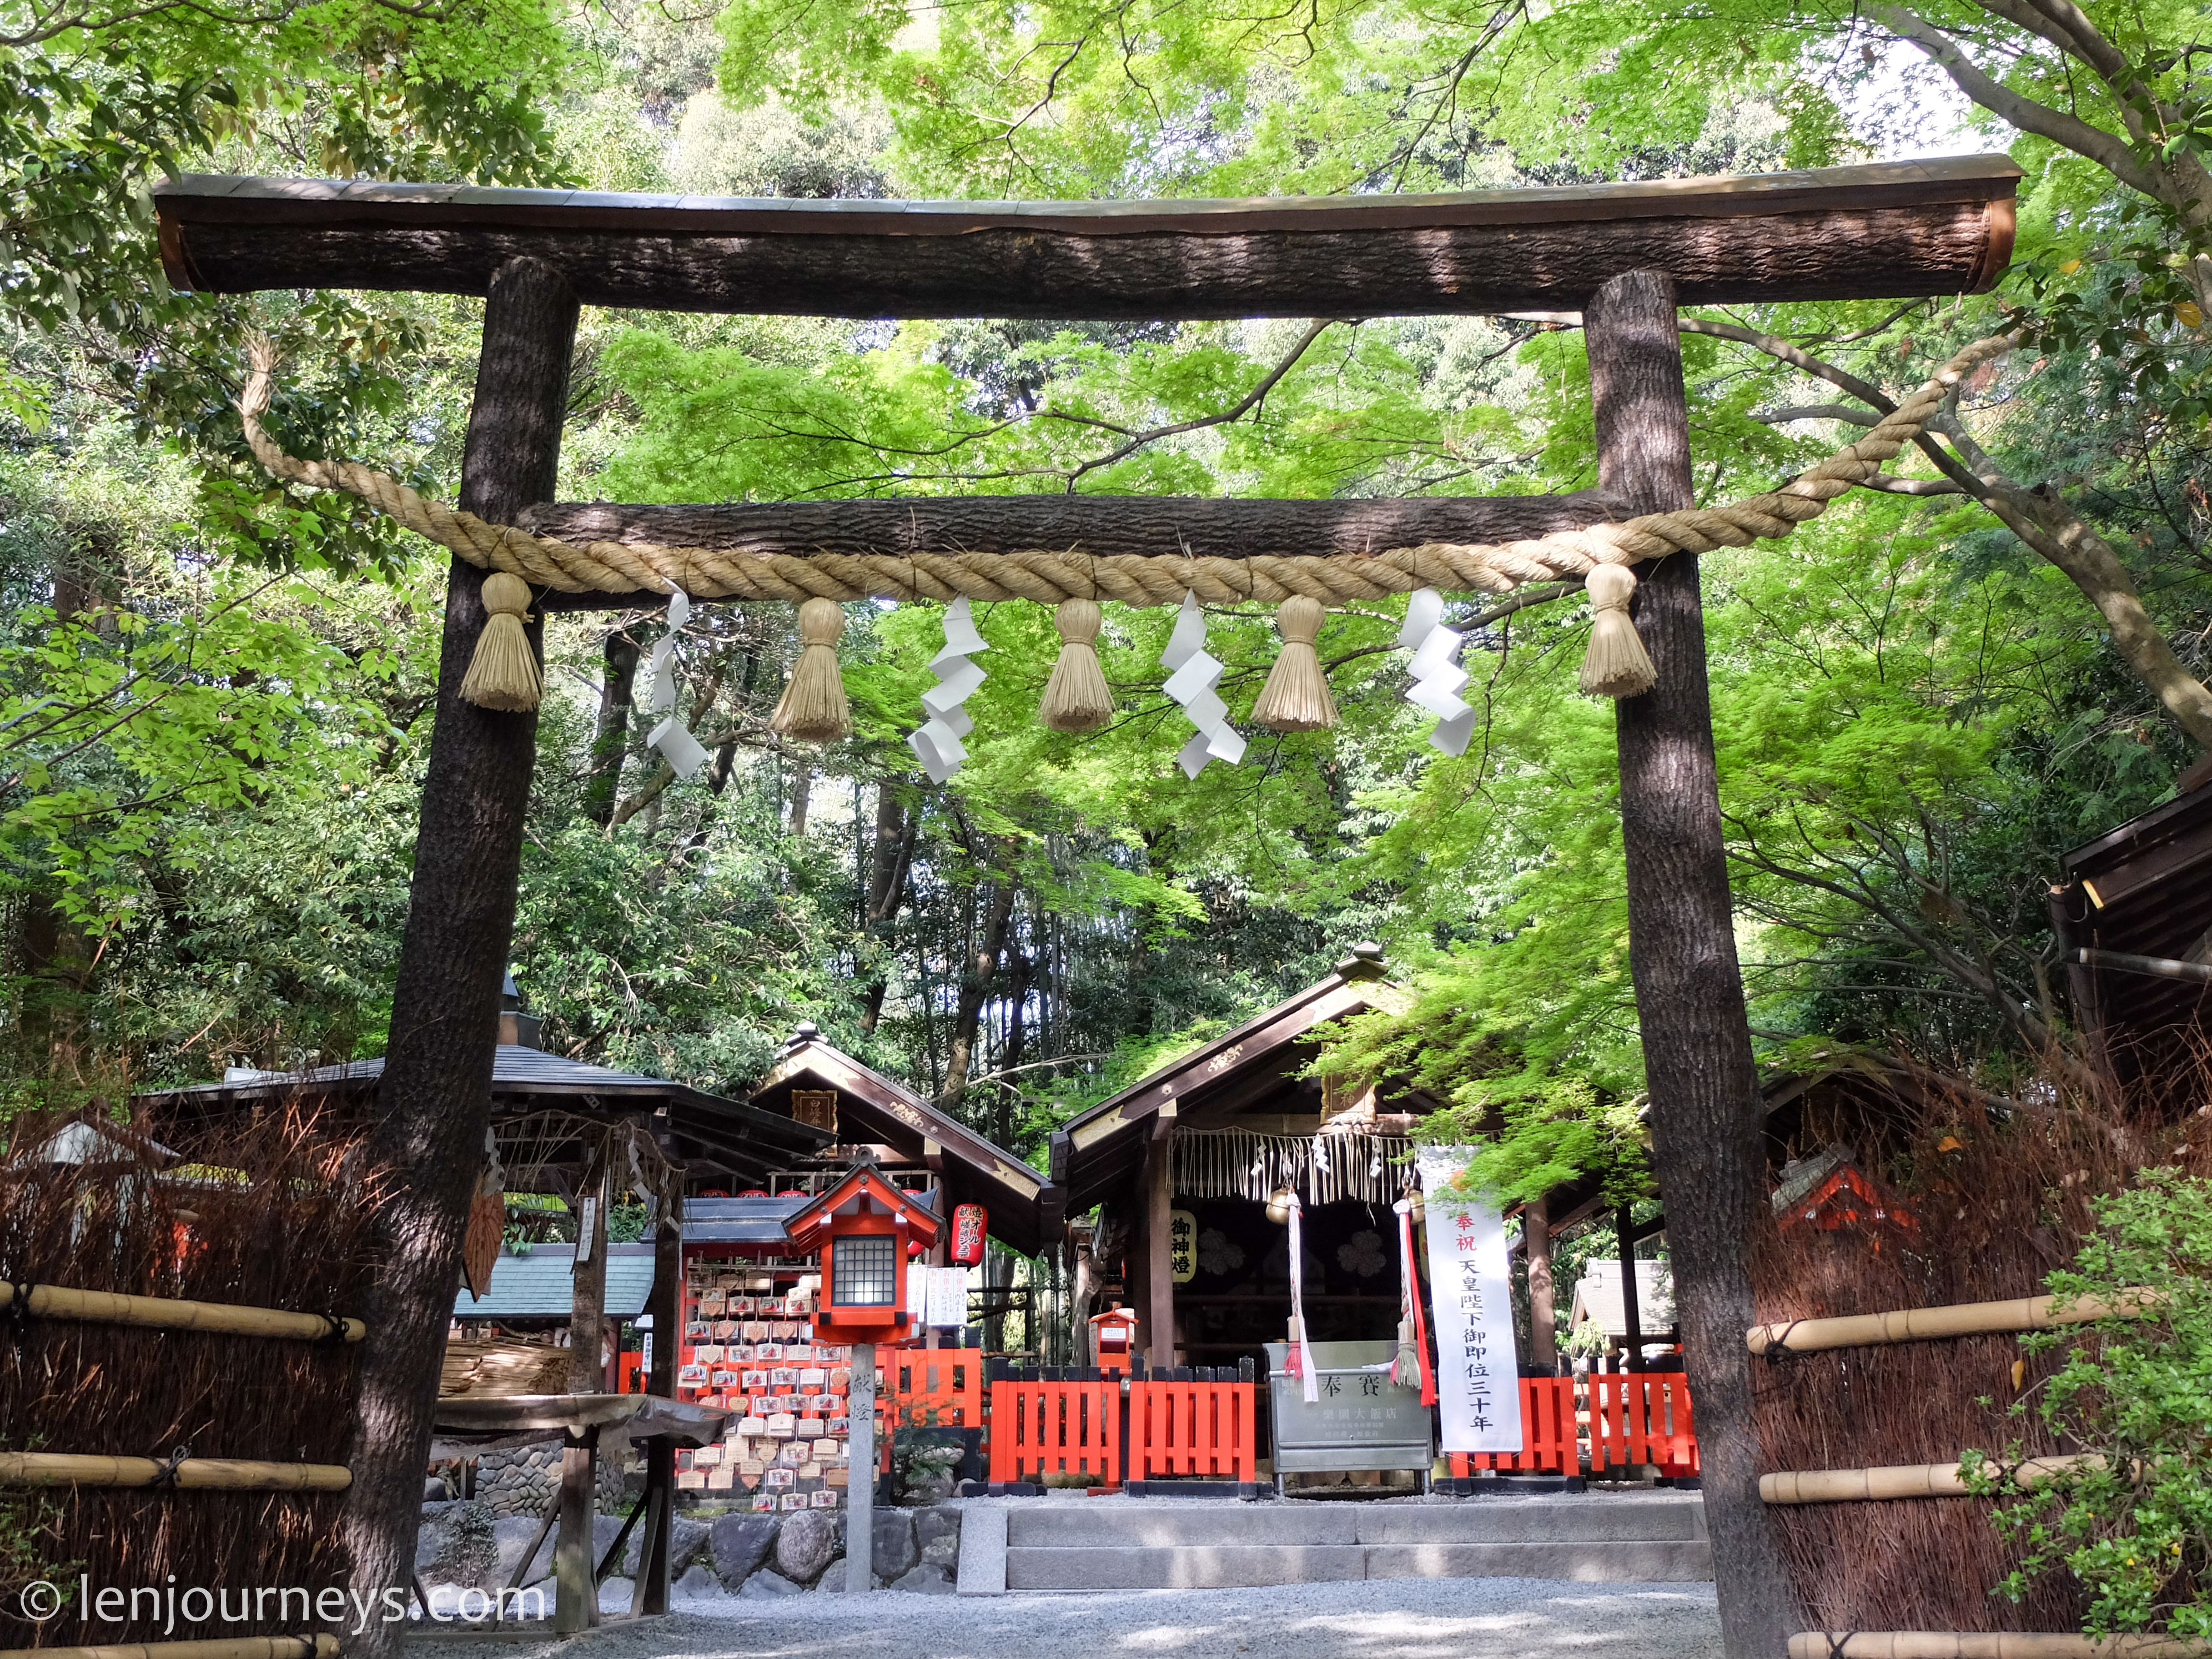 A beautiful shrine at the entrance of Arashiyama Bamboo Groves